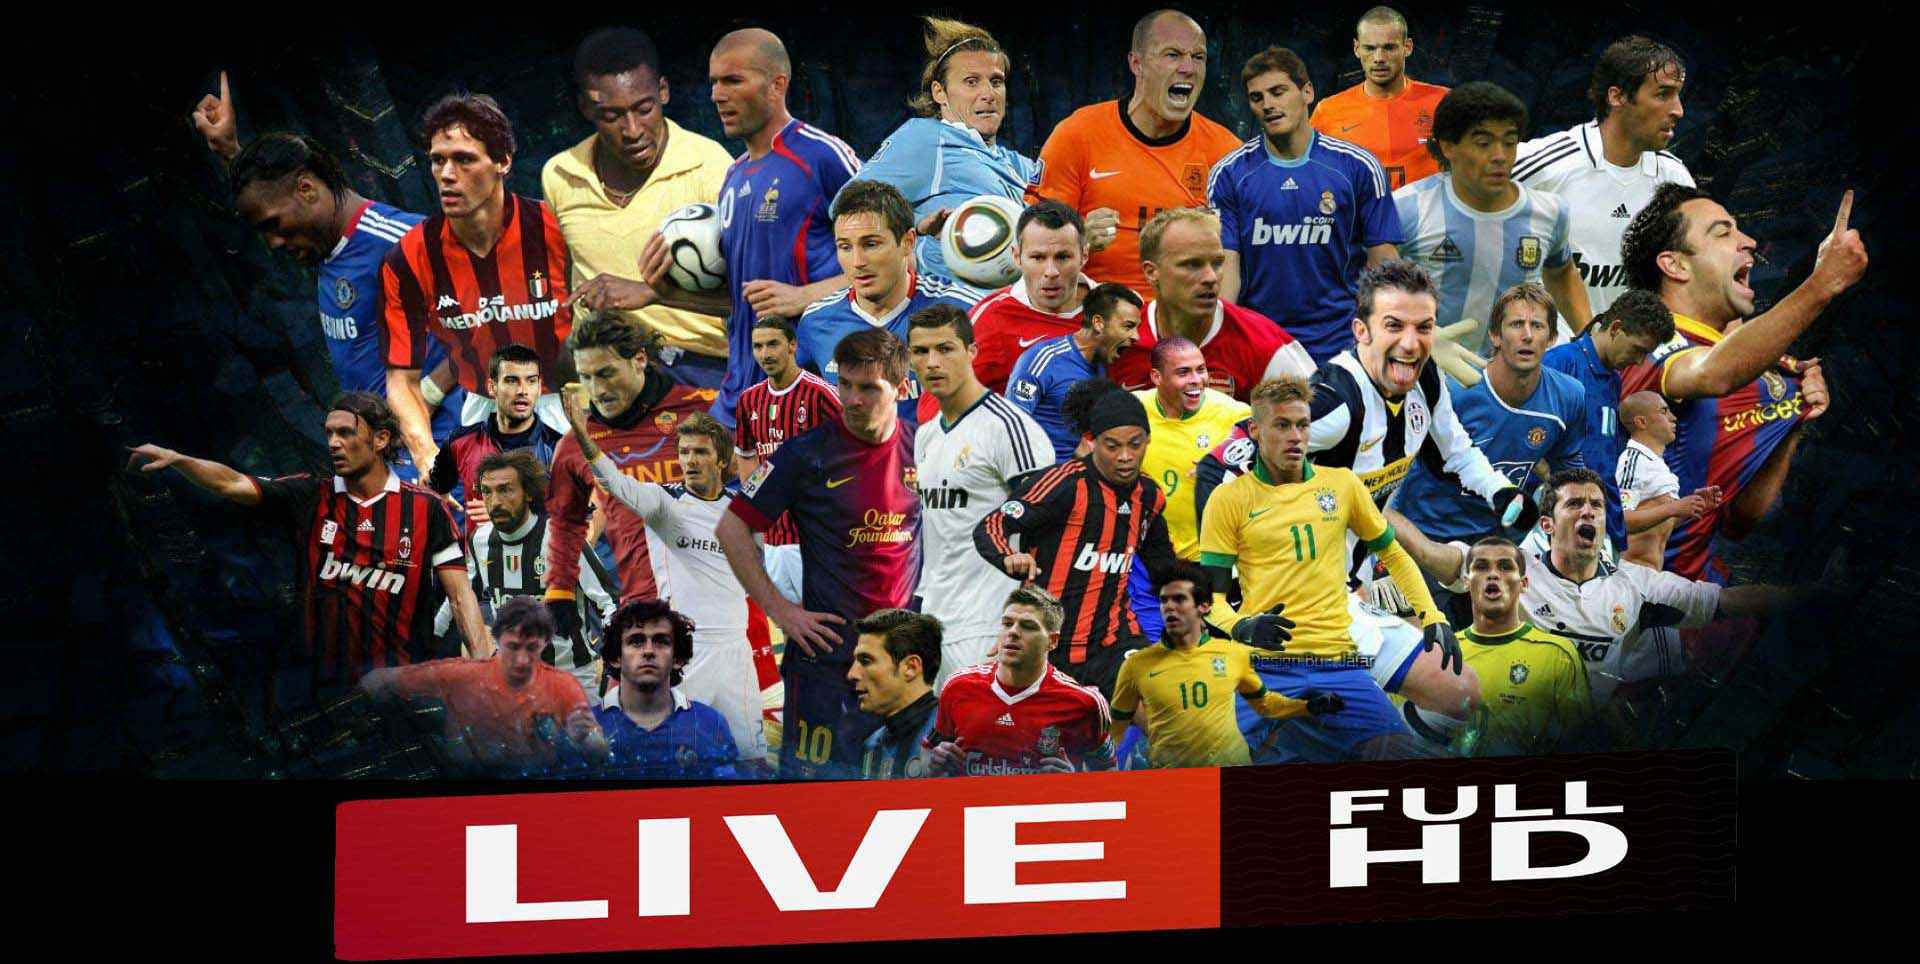 atletico-vs-bayern-uefa-stream-live